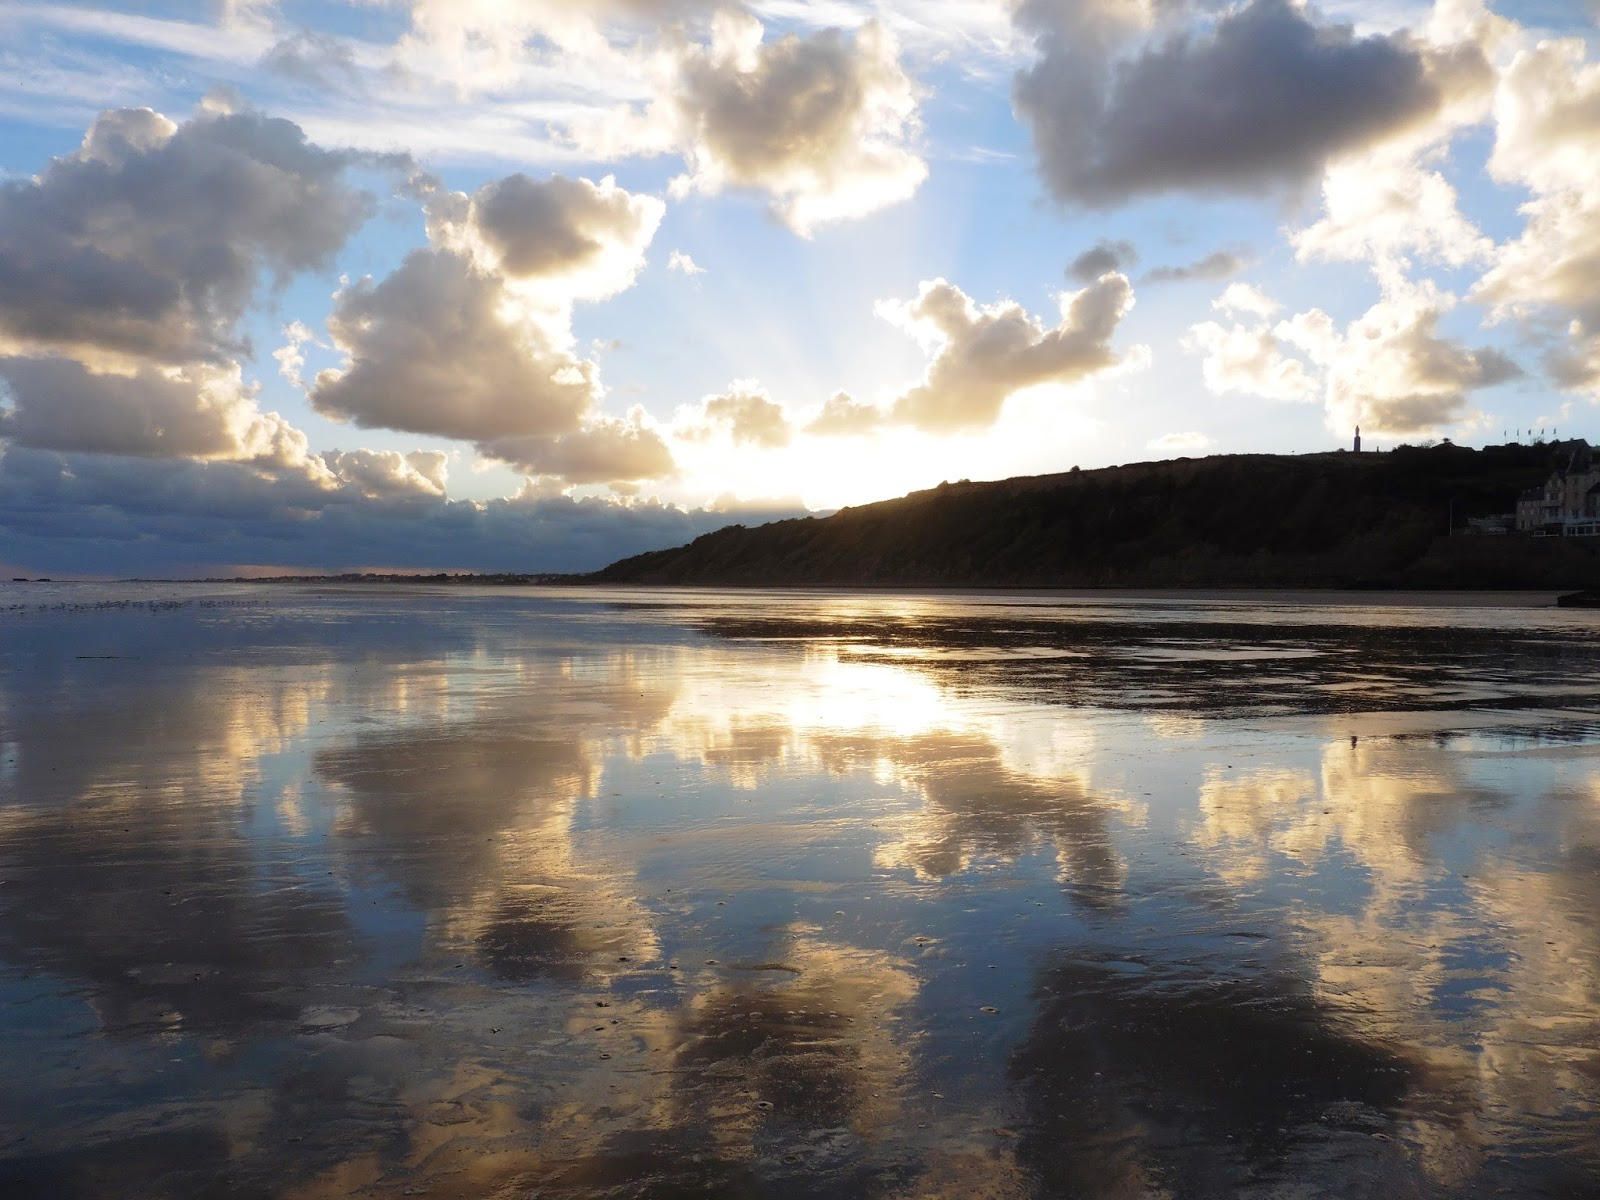 Gold Beach in Arromanches-les-Bains, France